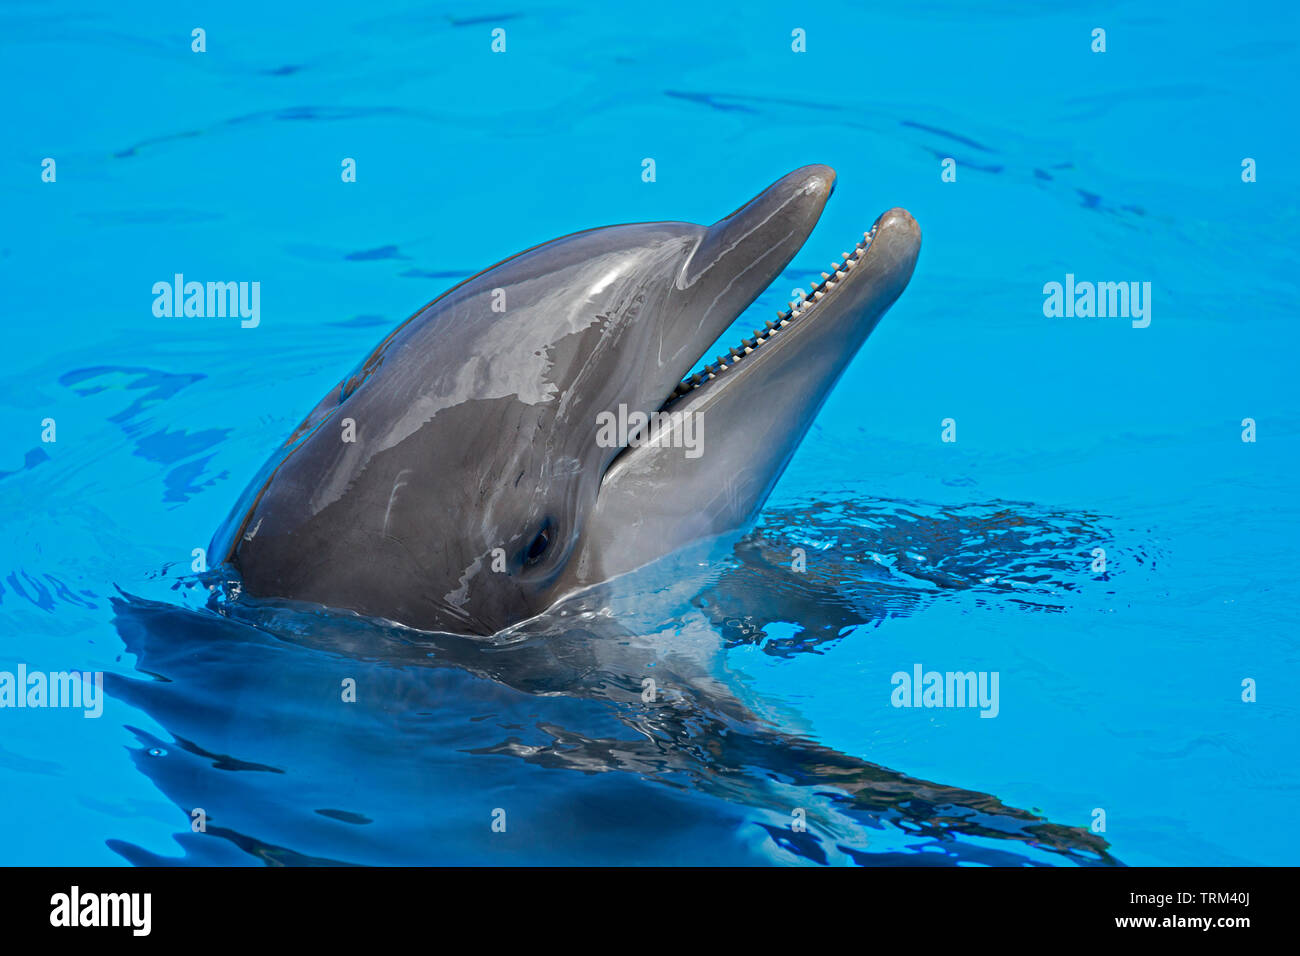 David Fleetham Bottlenose Dolphin Stock Photos & David Fleetham